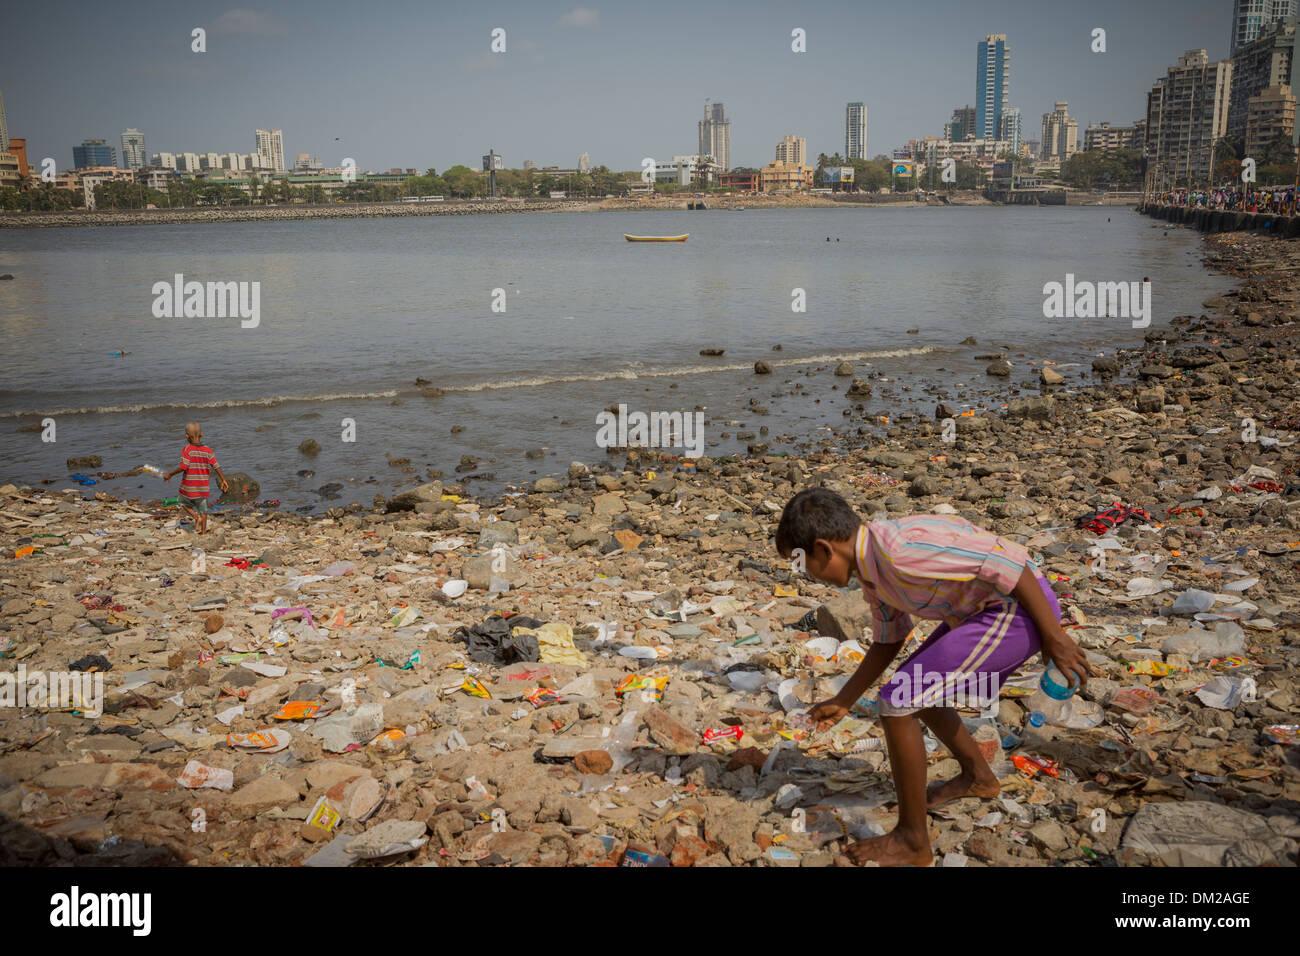 Niño recogiendo basura en Mumbai (Bombay), India Imagen De Stock